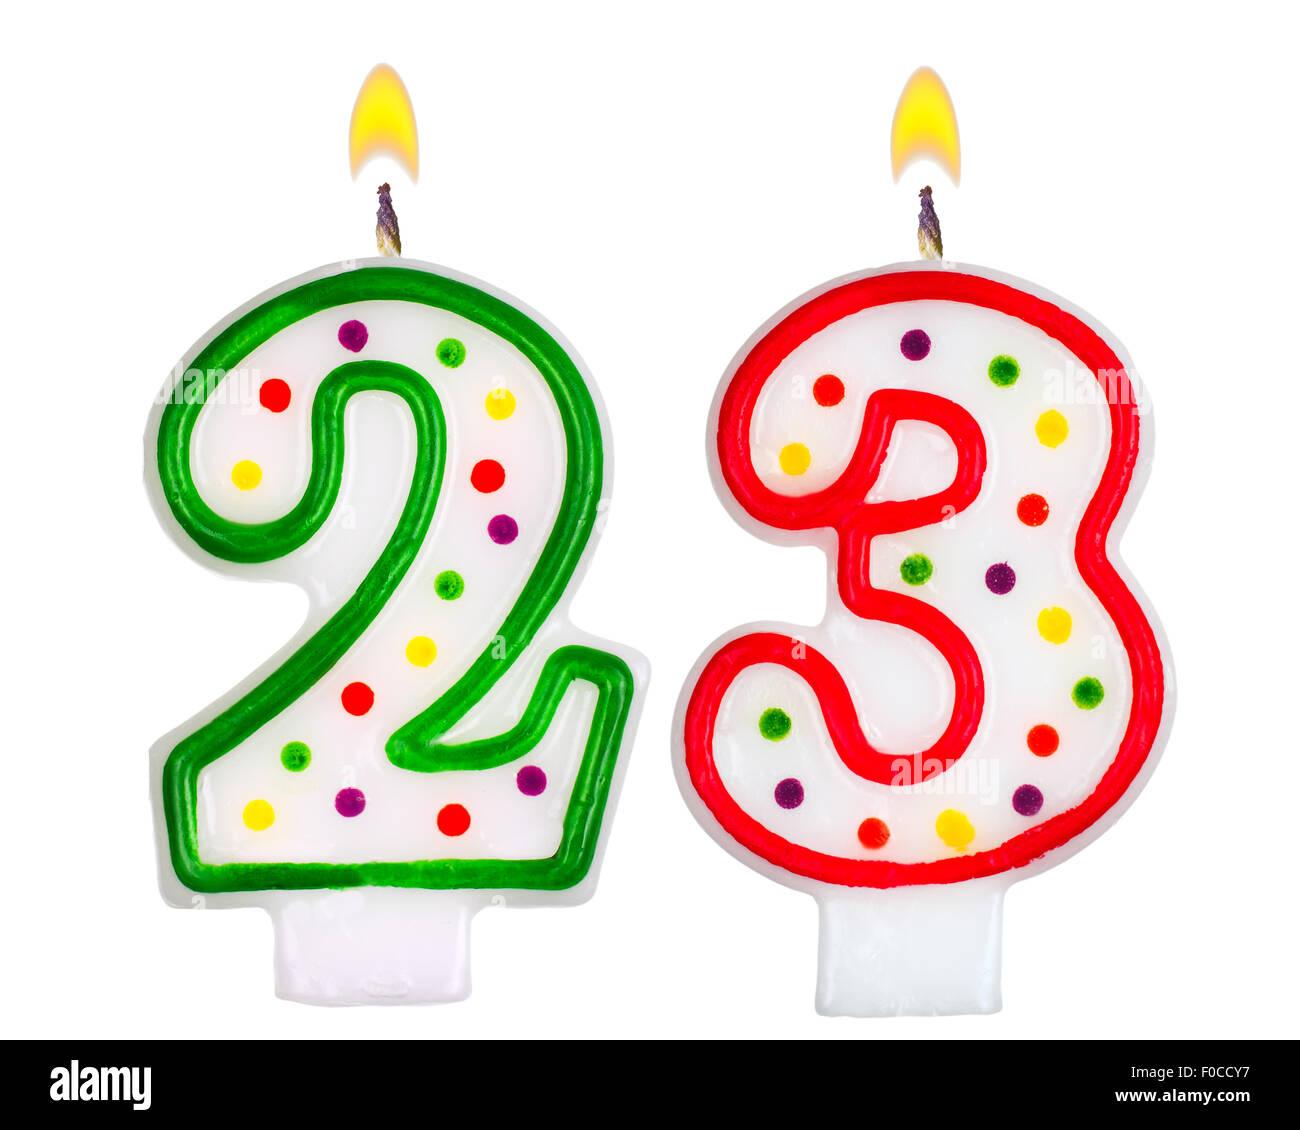 Birthday Number 23